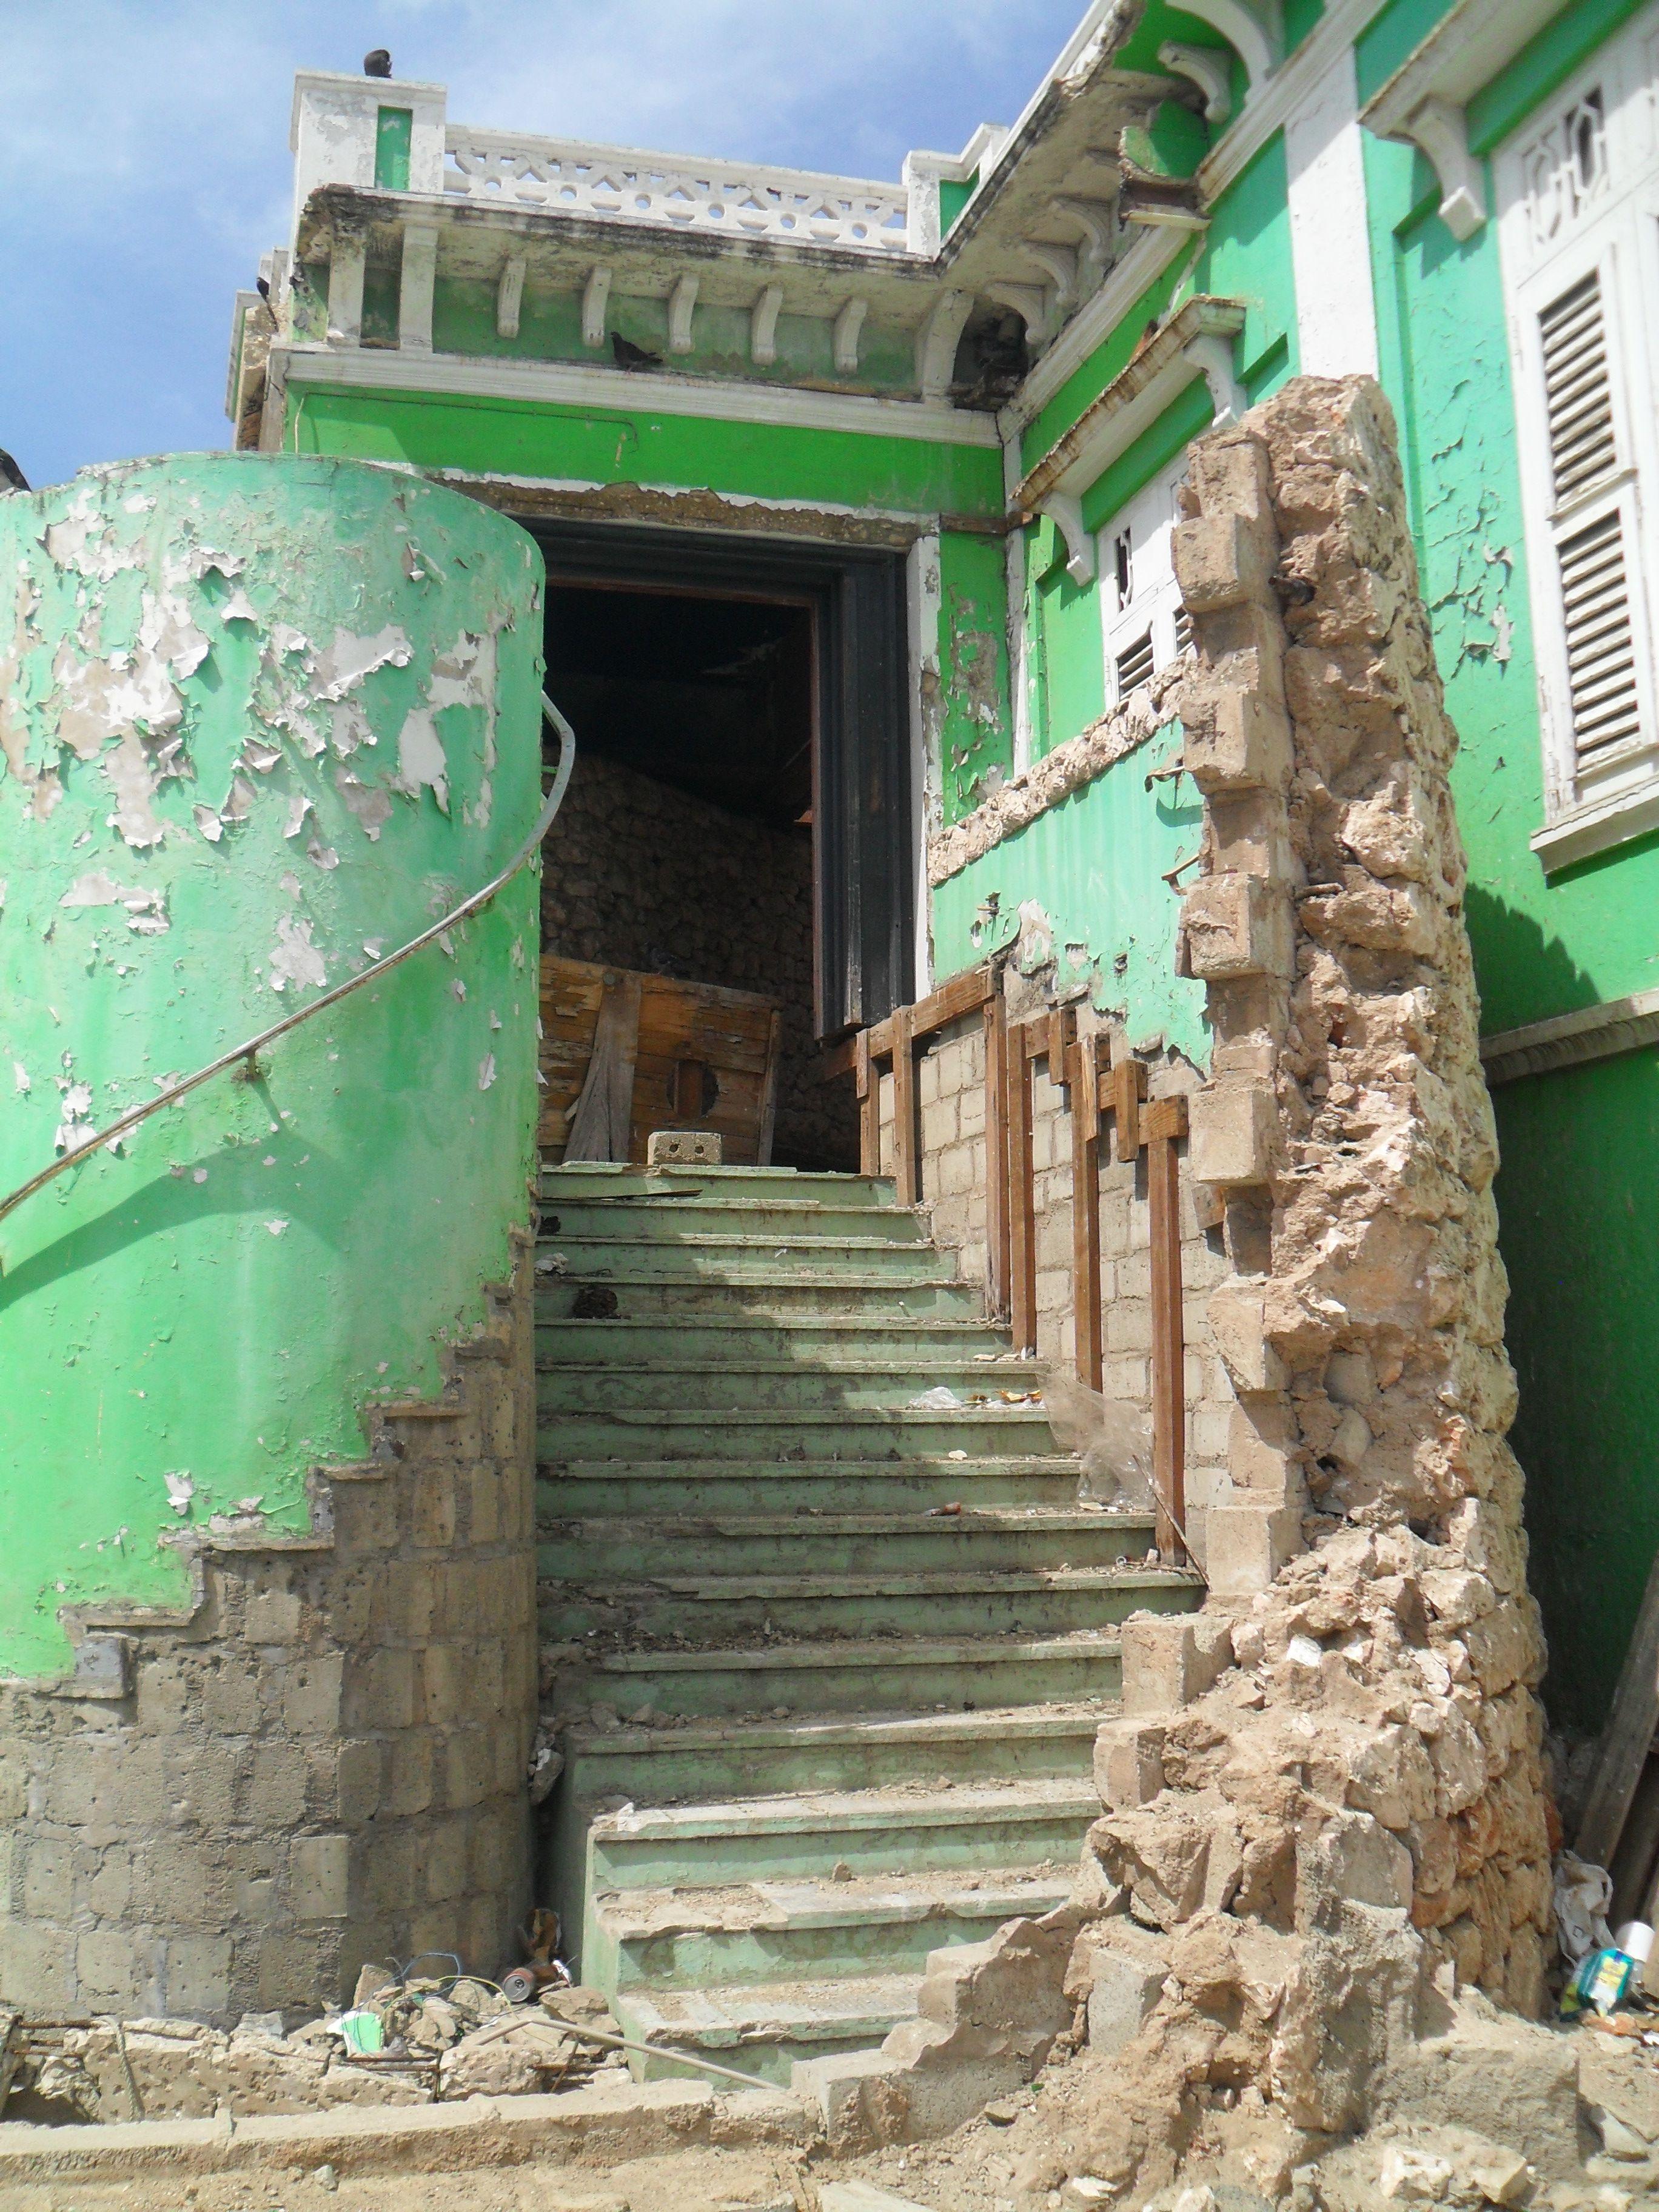 old building in Oranjestad Aruba which I